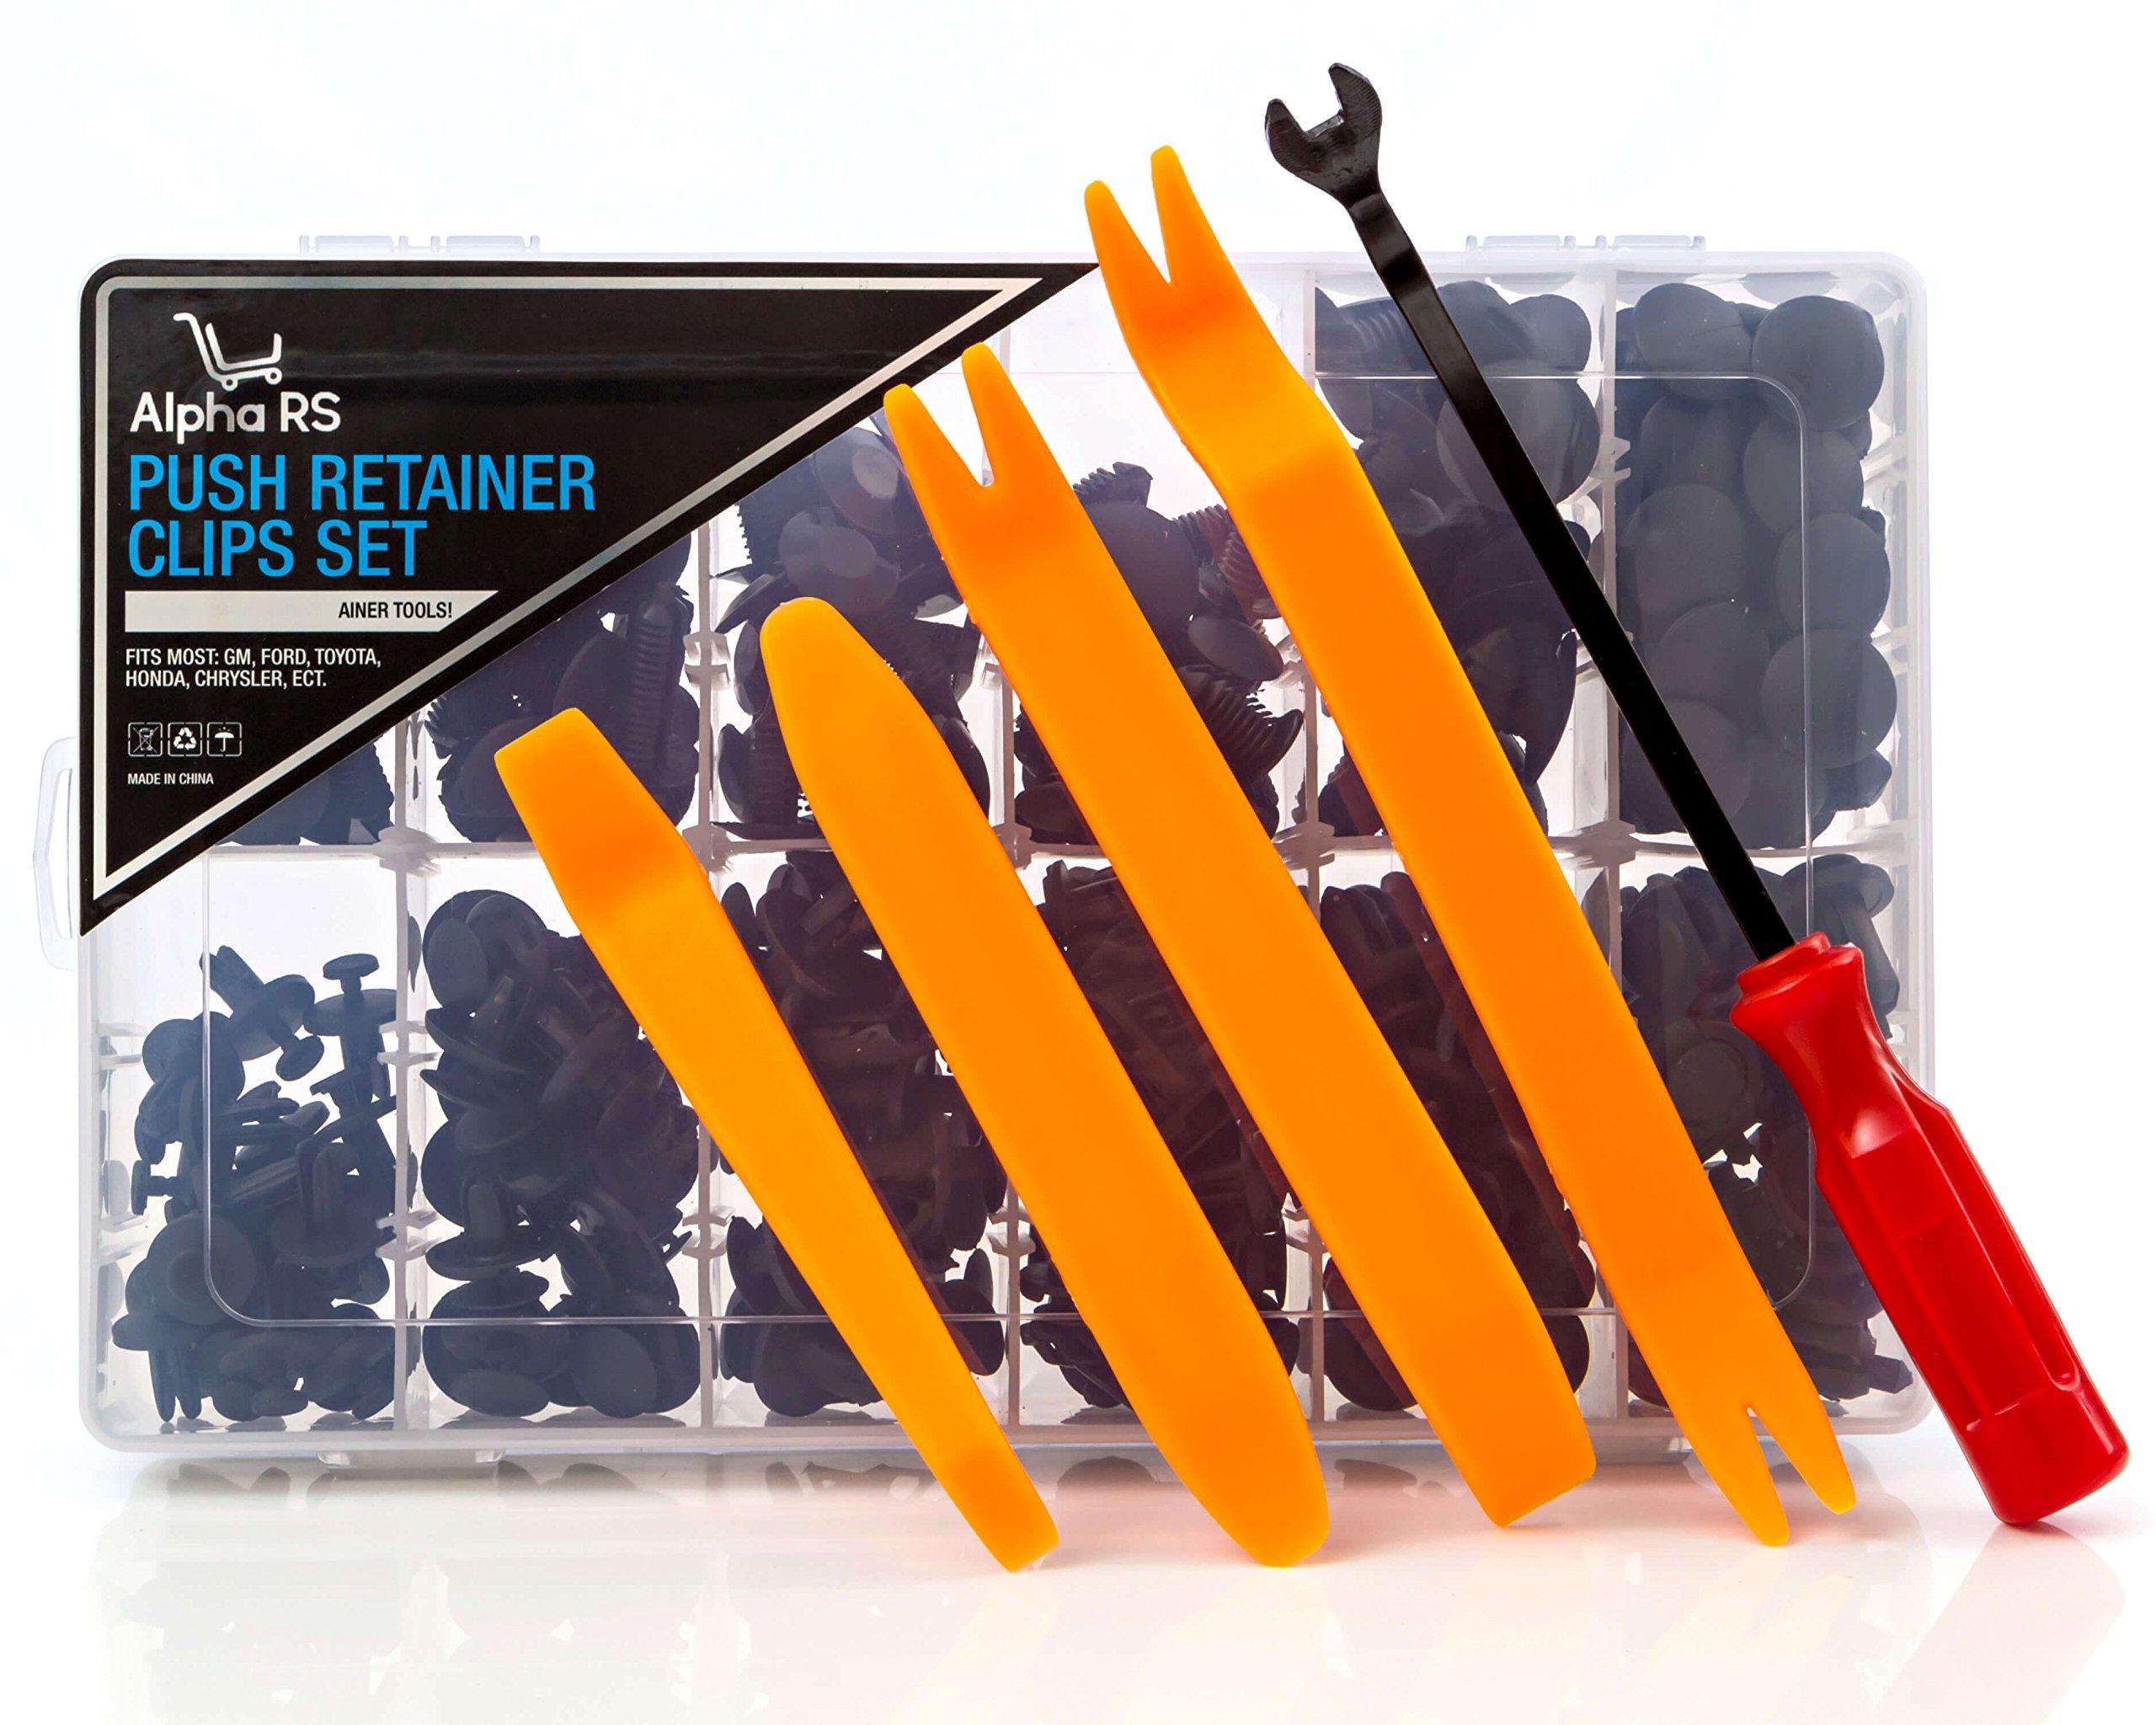 Car Auto Truck Plastic Push Pin Retainer Clip Fastener Tool Kit | 240pc Large Storage Box Set Removal Install Bumper Audio Interior Door Panel Fender Trim Rivet Accessory GM Honda Ford Toyota Chrysler